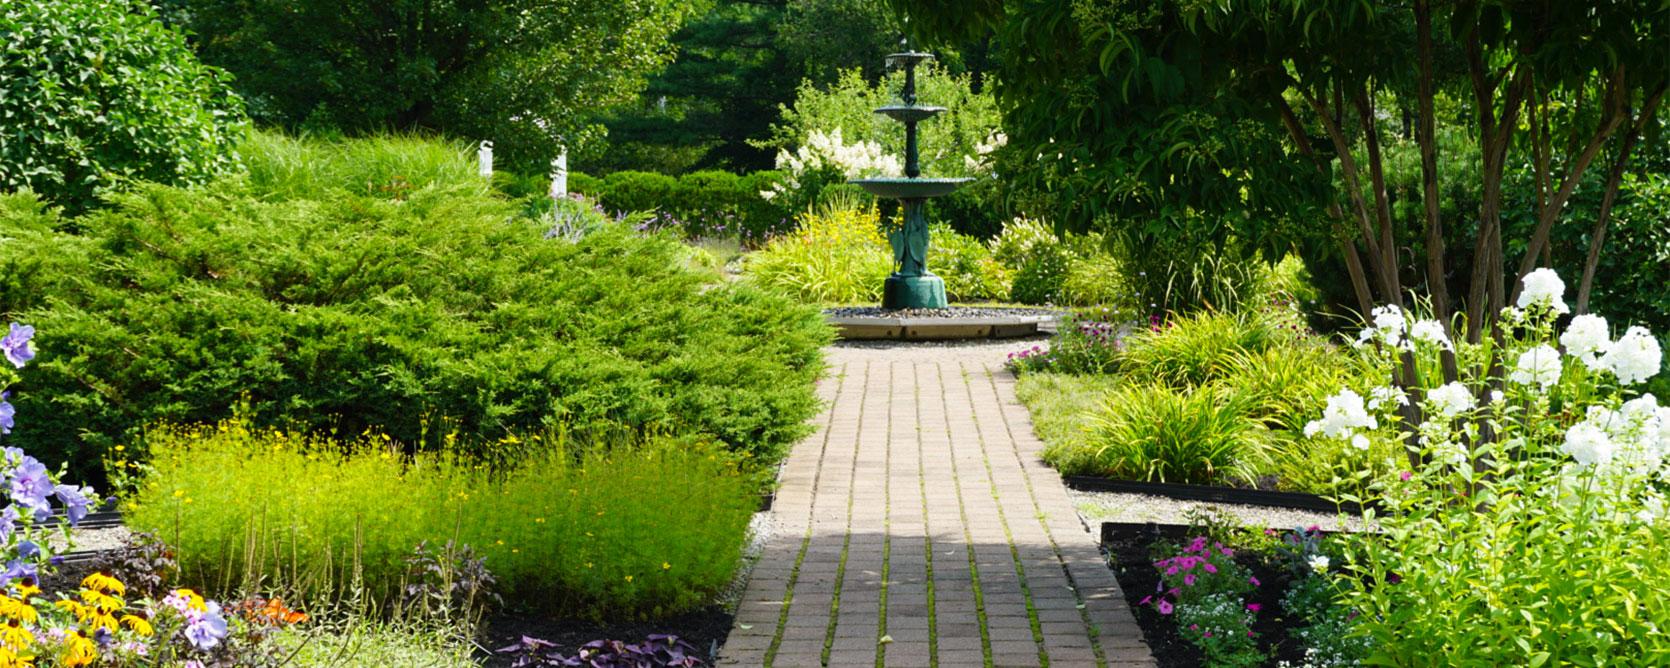 The Gardens at Pineland Farms - Pineland Farms, Inc